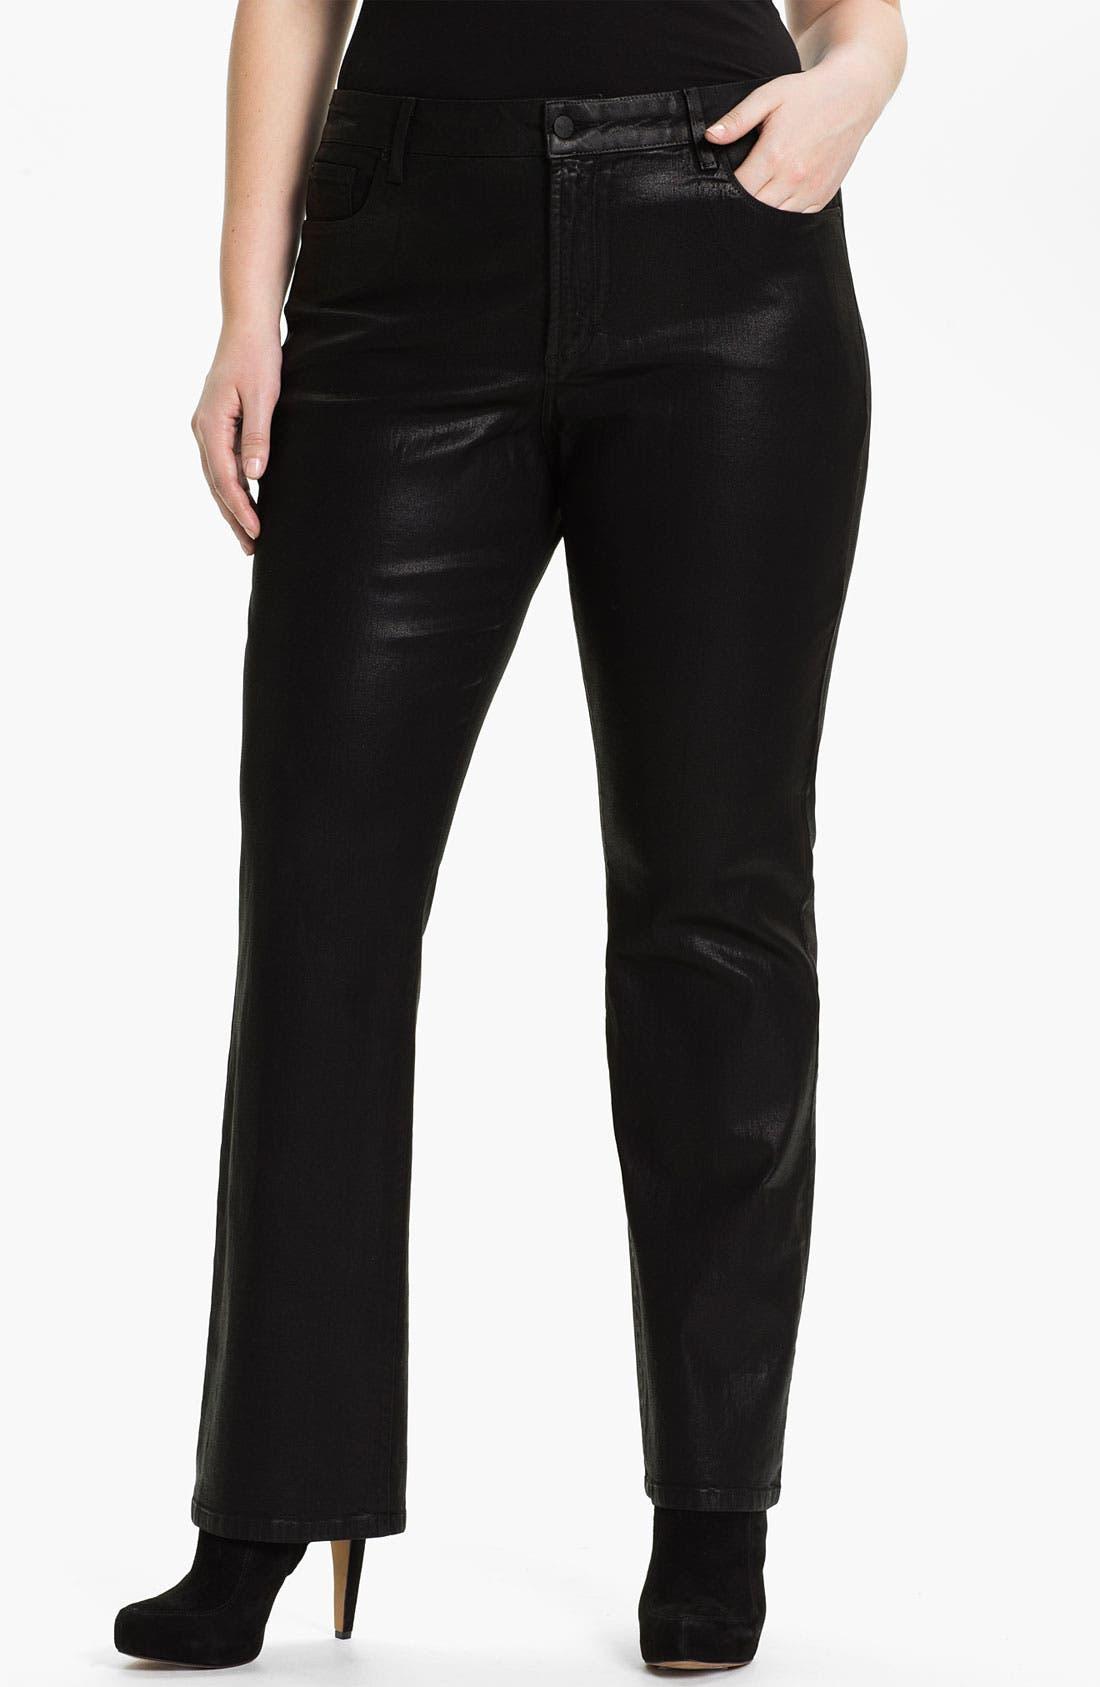 Main Image - NYDJ 'Marilyn' Coated Bootcut Jeans (Plus)